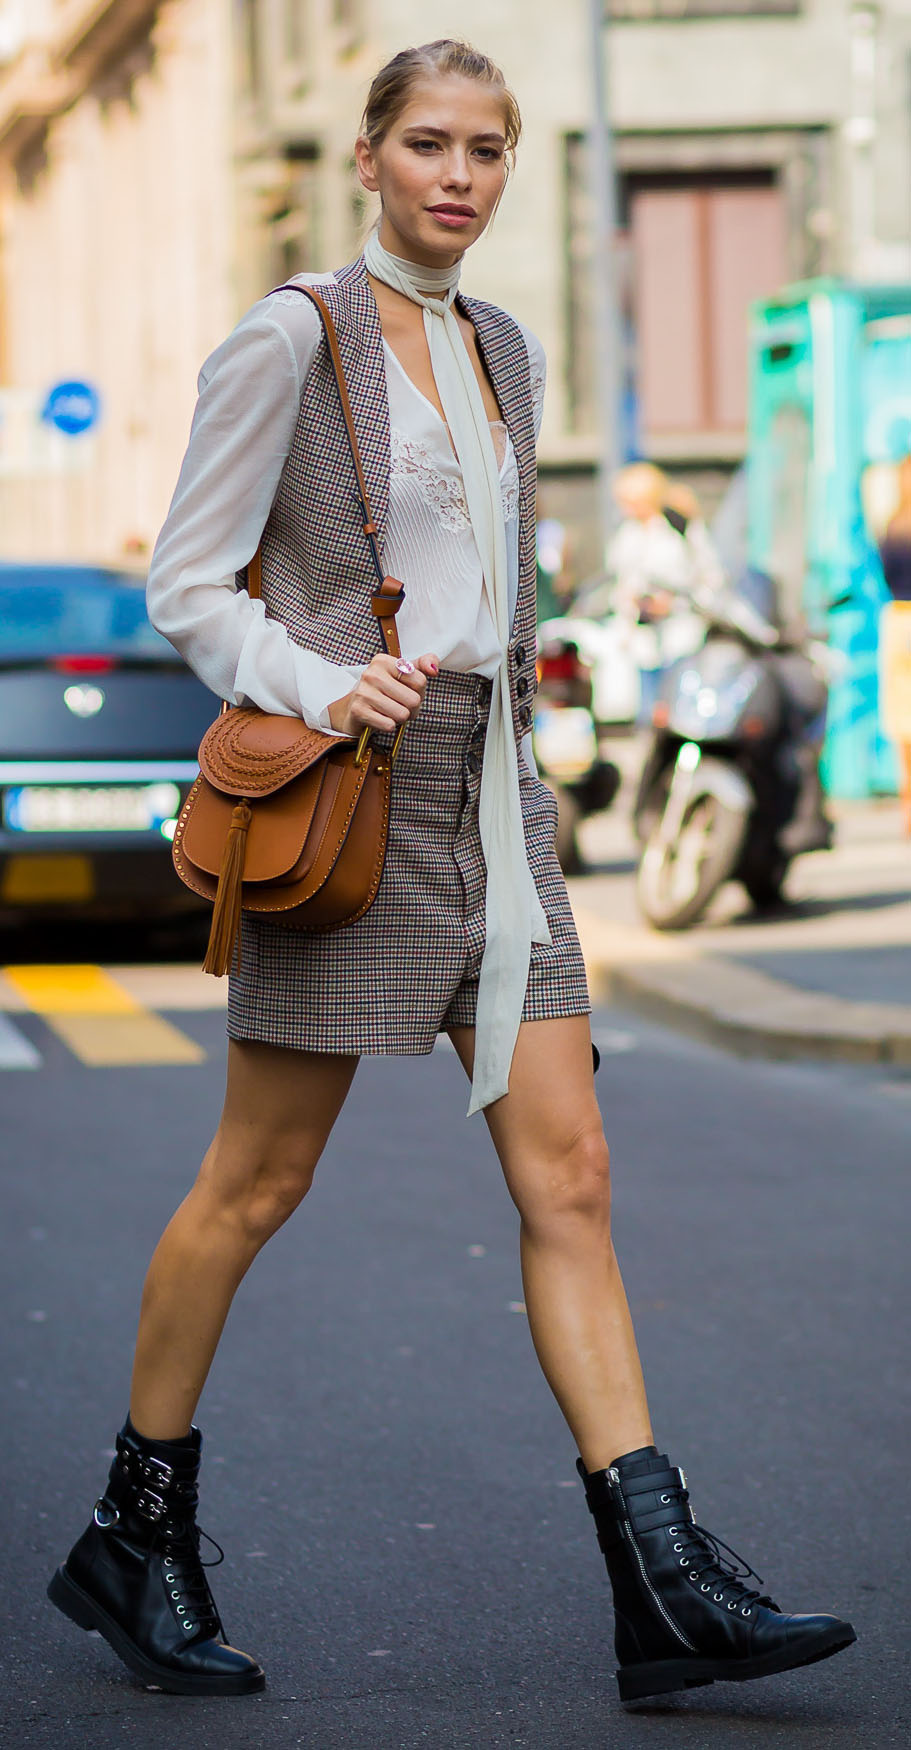 grayl-shorts-plaid-cognac-bag-white-top-blouse-grayl-vest-tailor-bun-black-shoe-booties-elenaperminova-fall-winter-lunch.jpg